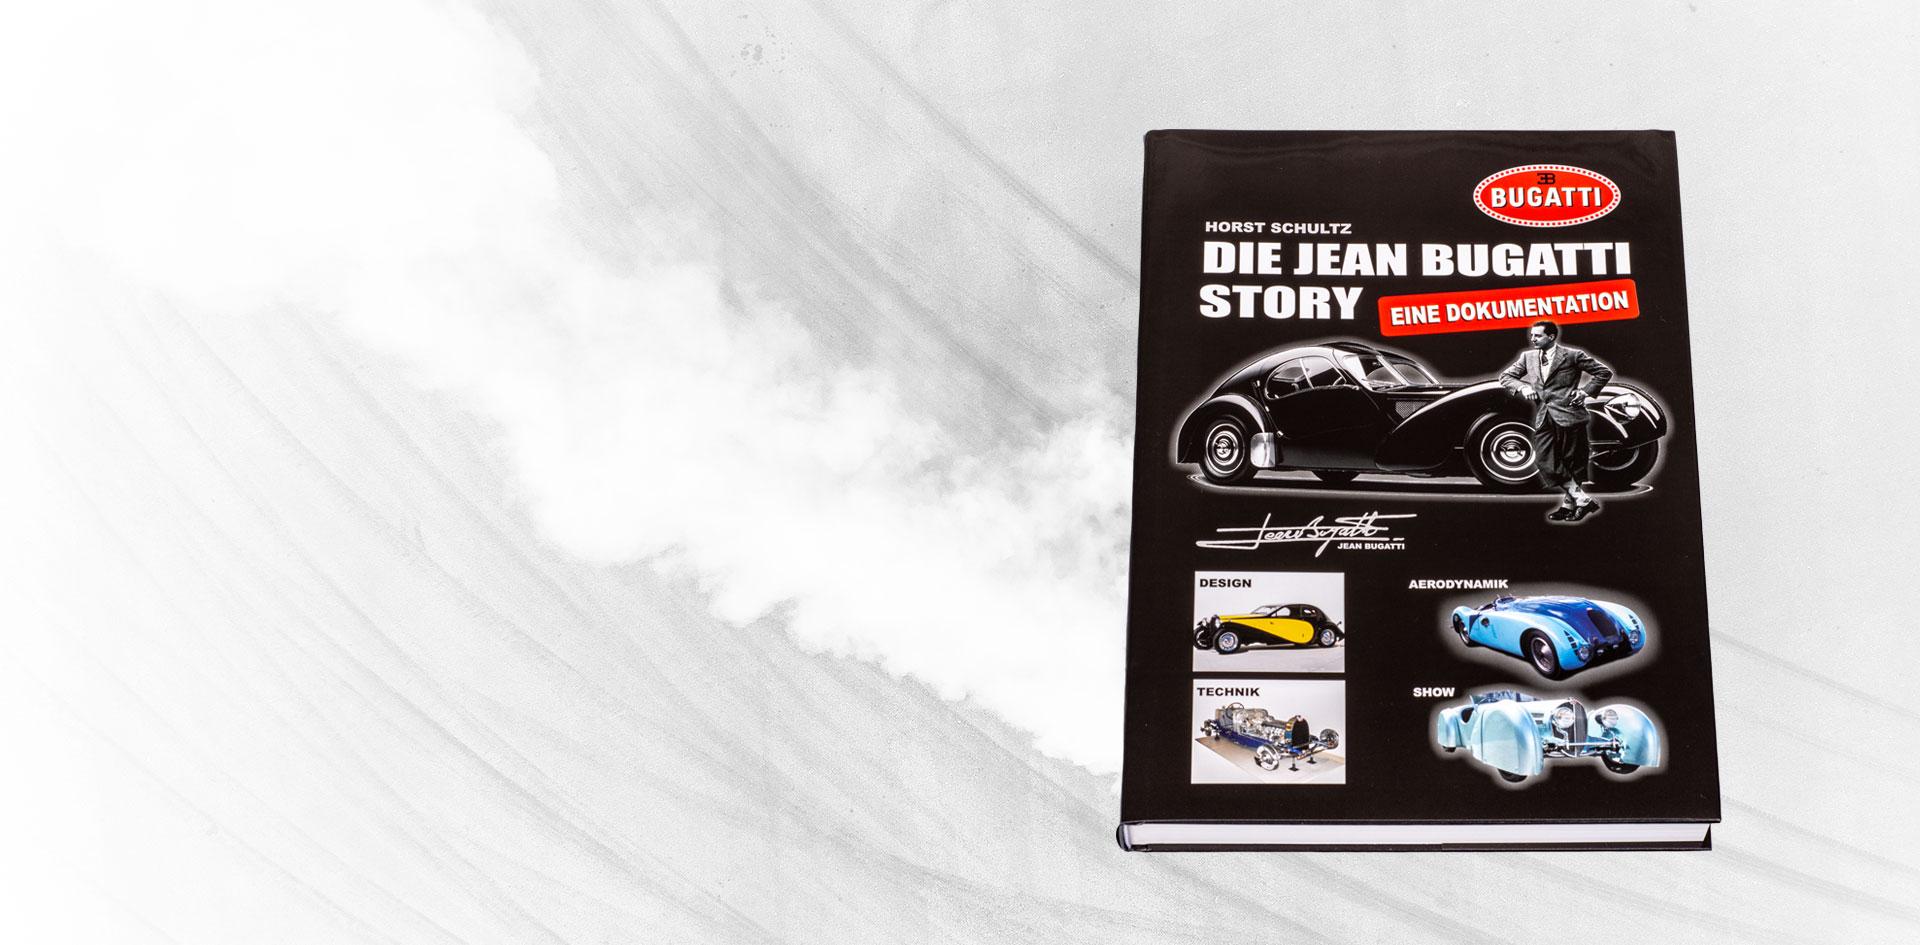 Die Jean Bugatti Story